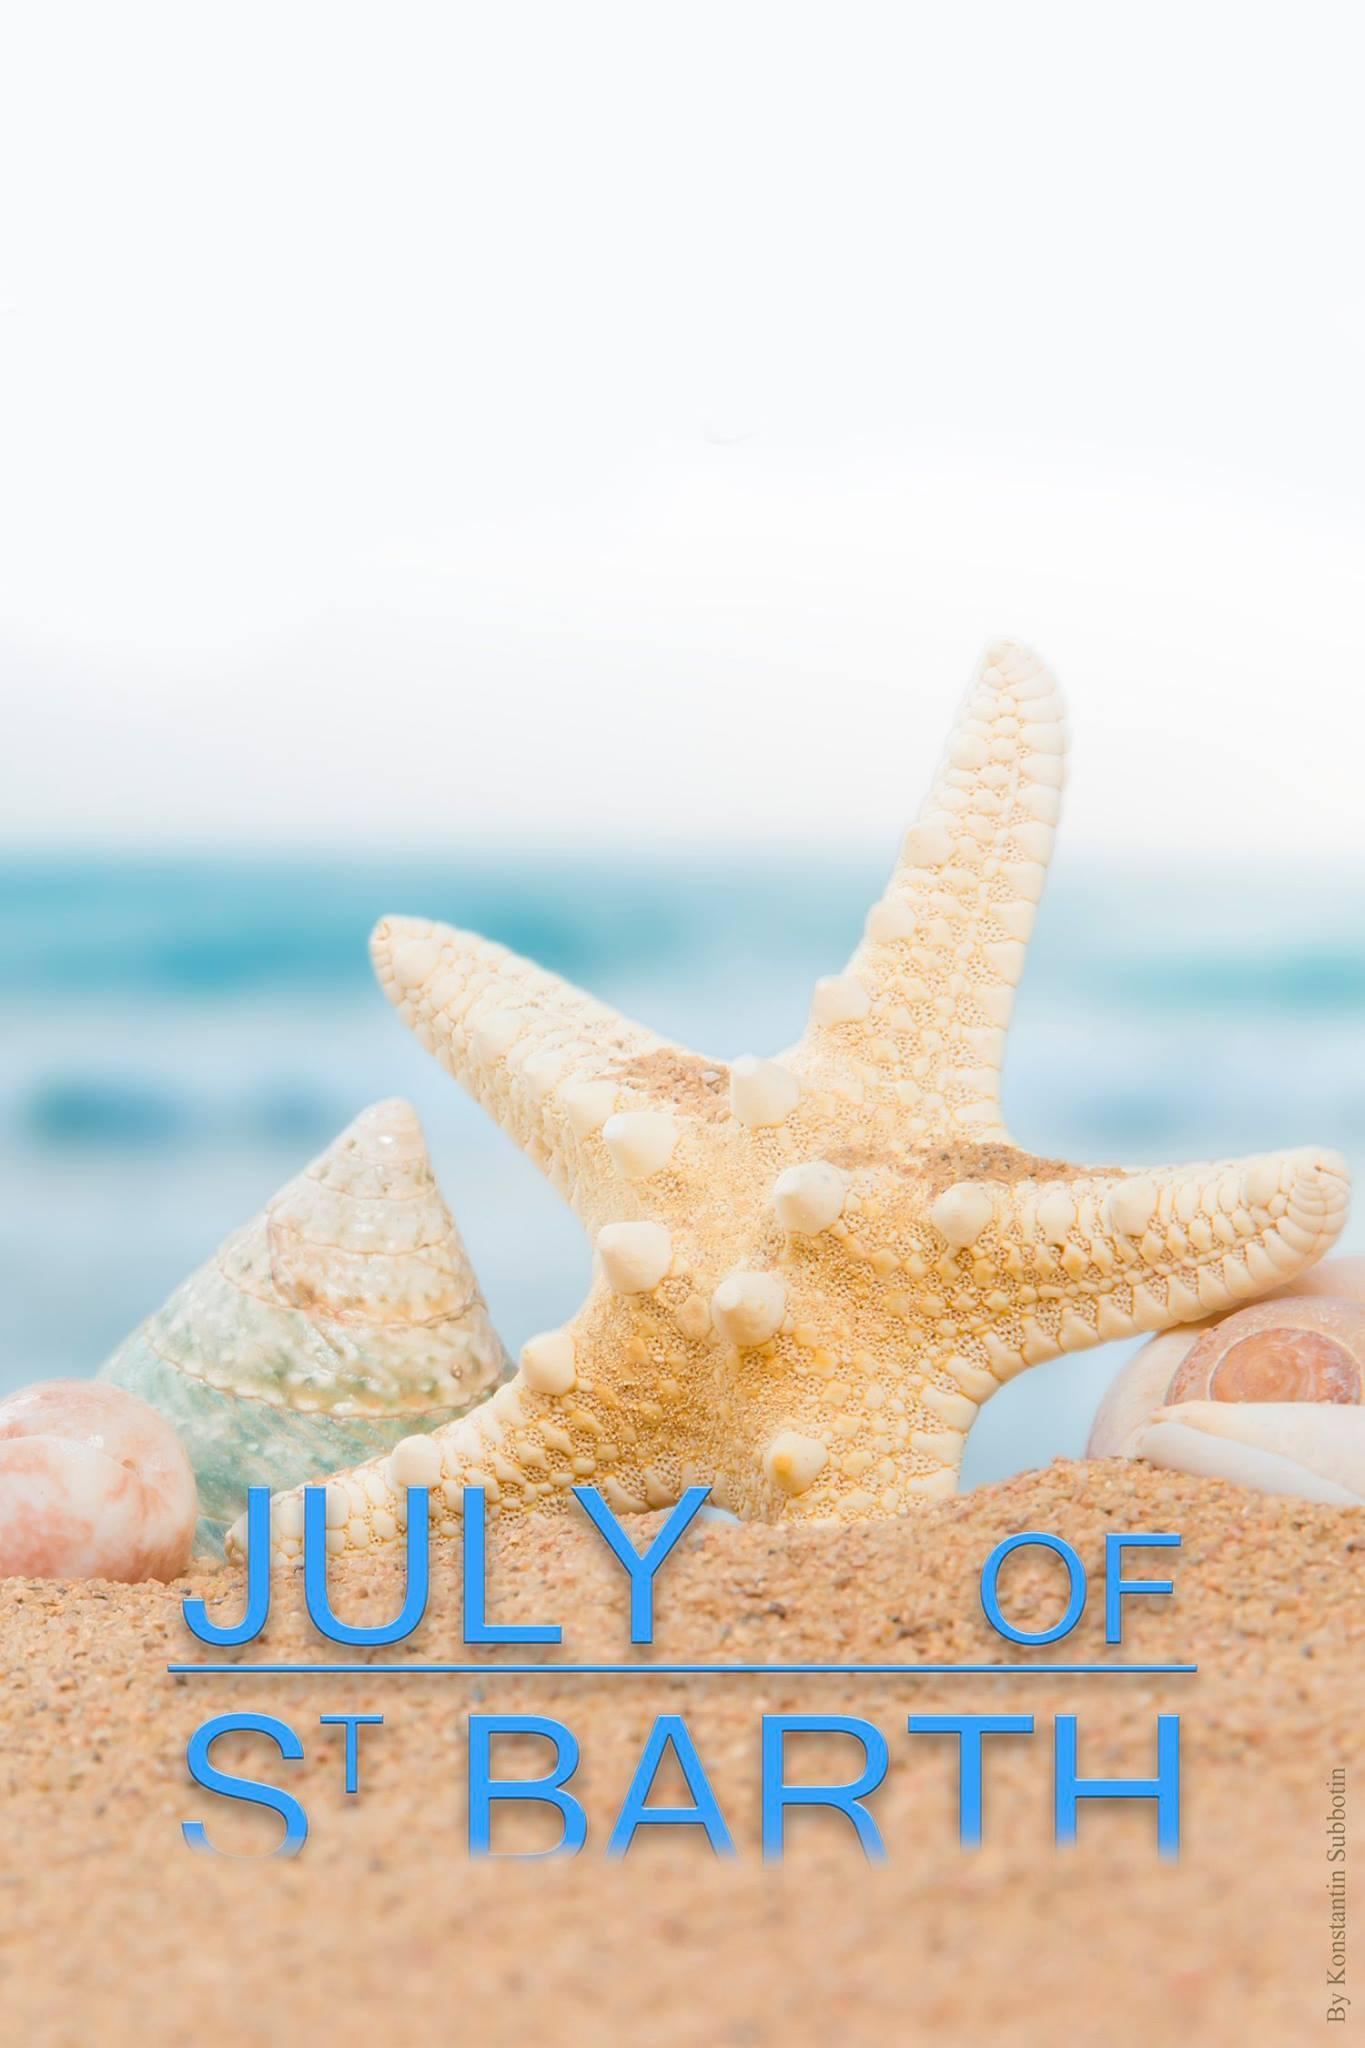 july-of-st-barth-creations-parfums-avis-cadeau